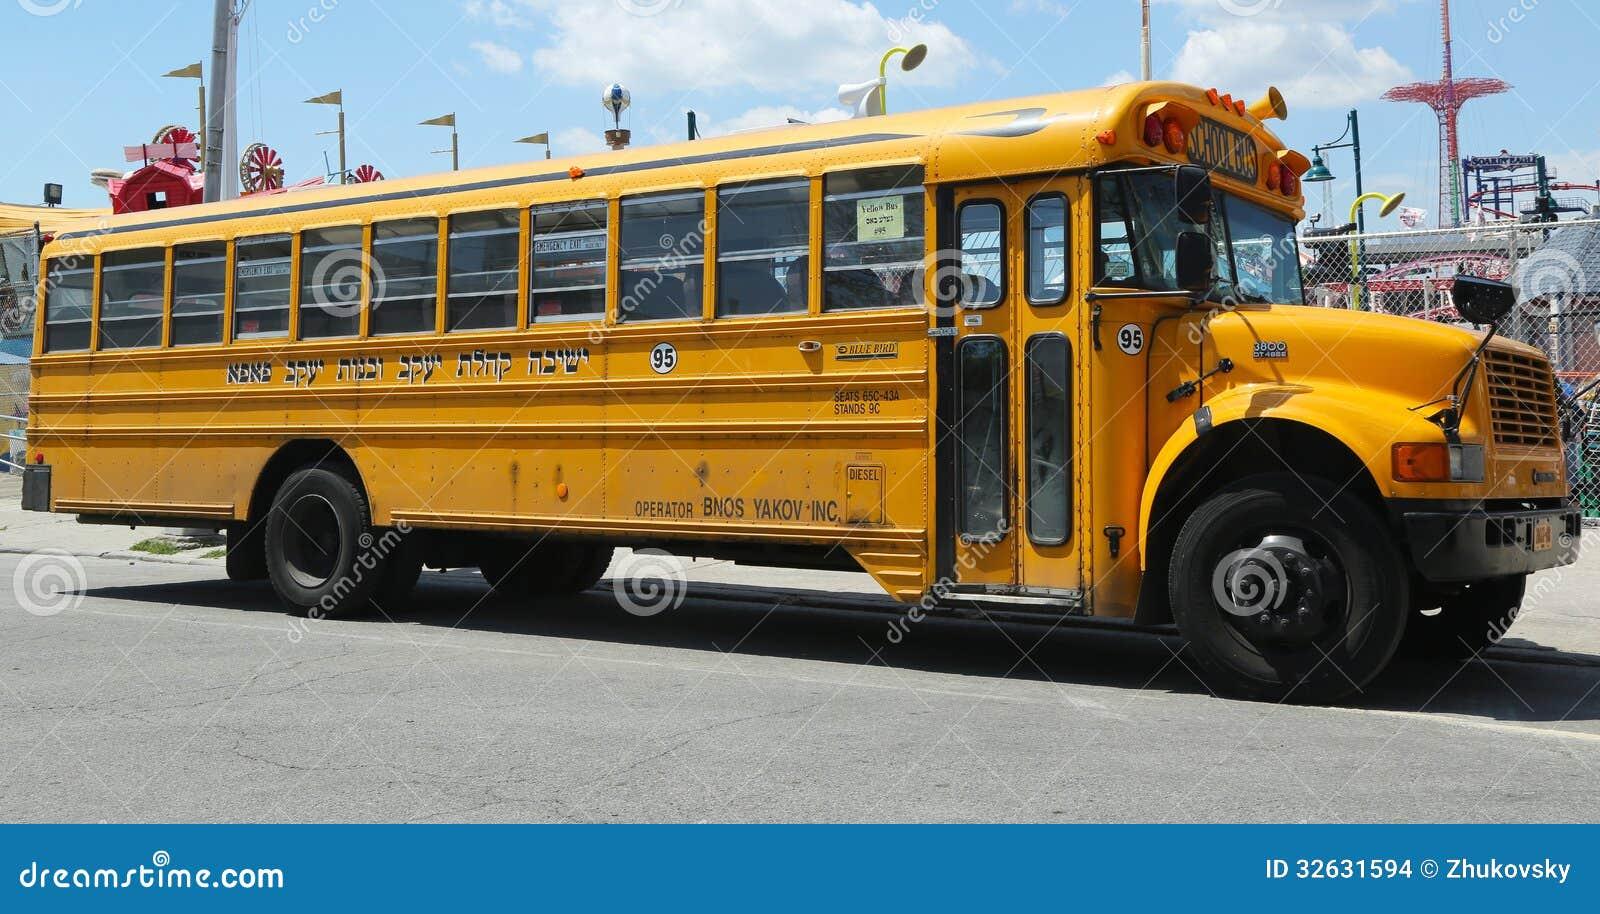 Coney Island School Trip